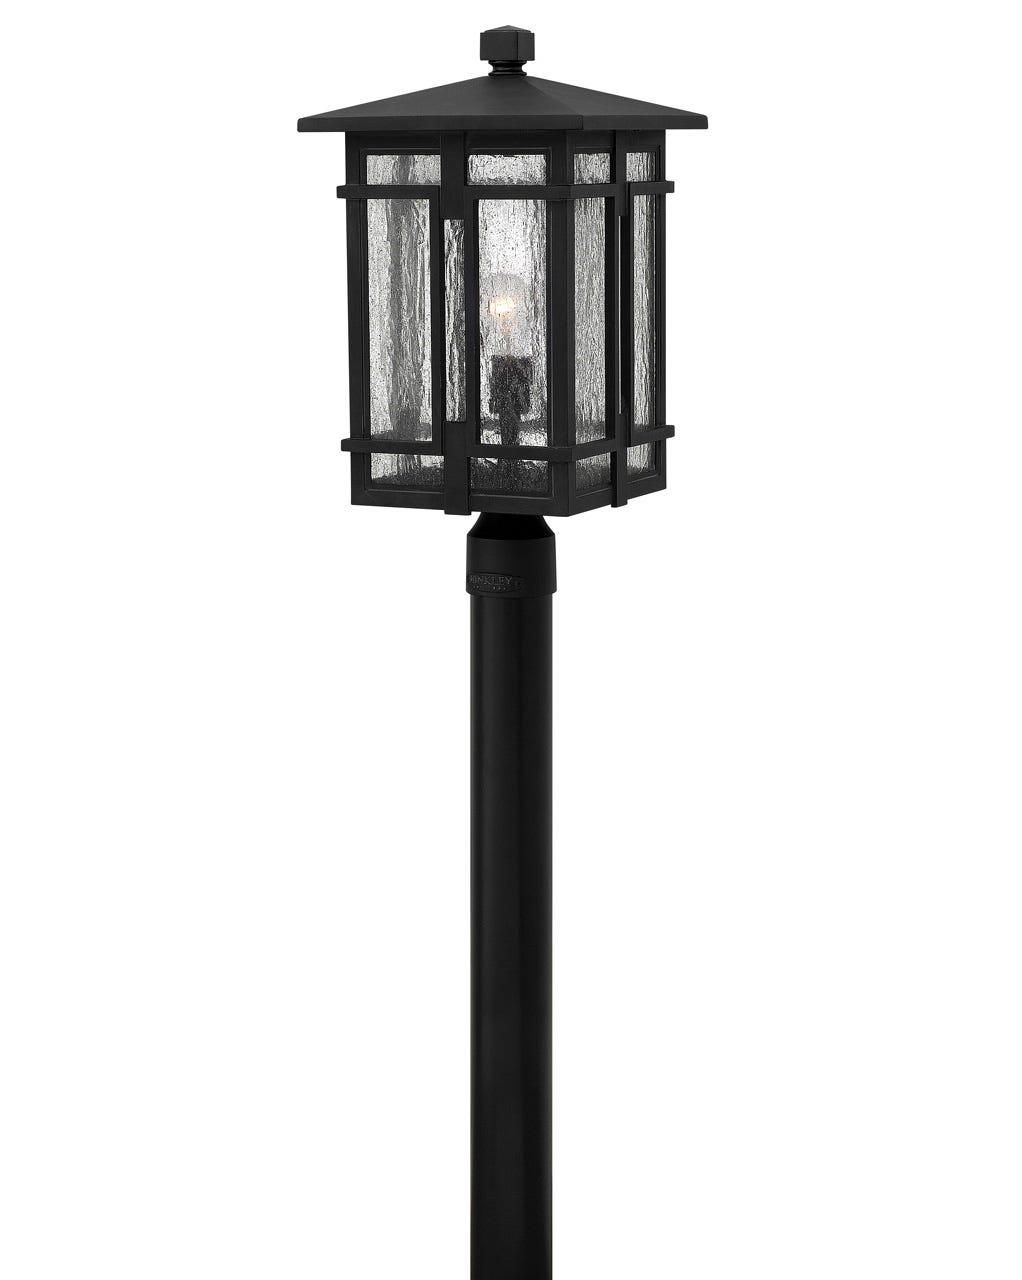 Tucker Large Post Top Or Pier Mount Lantern